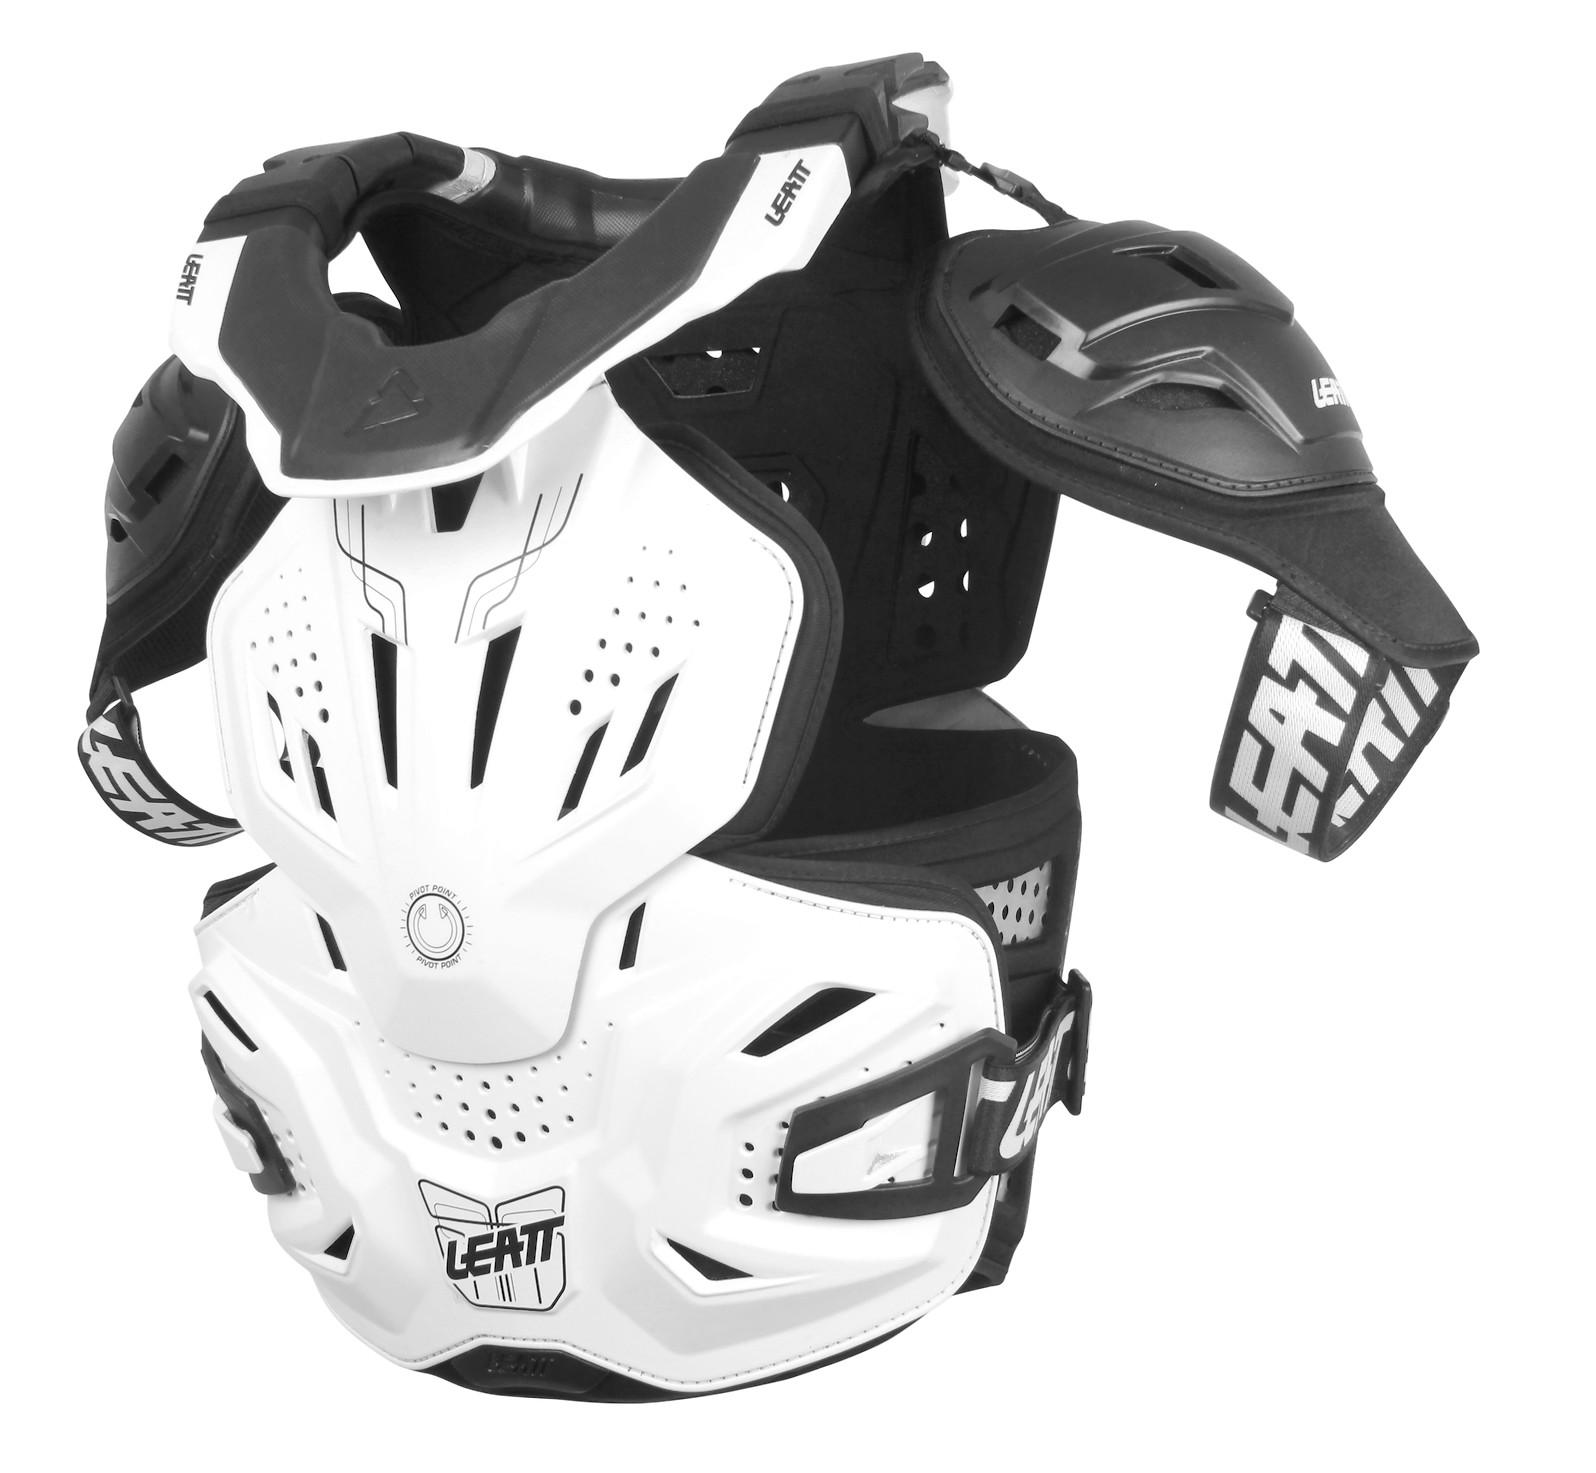 Leatt Fusion 3.0 - White